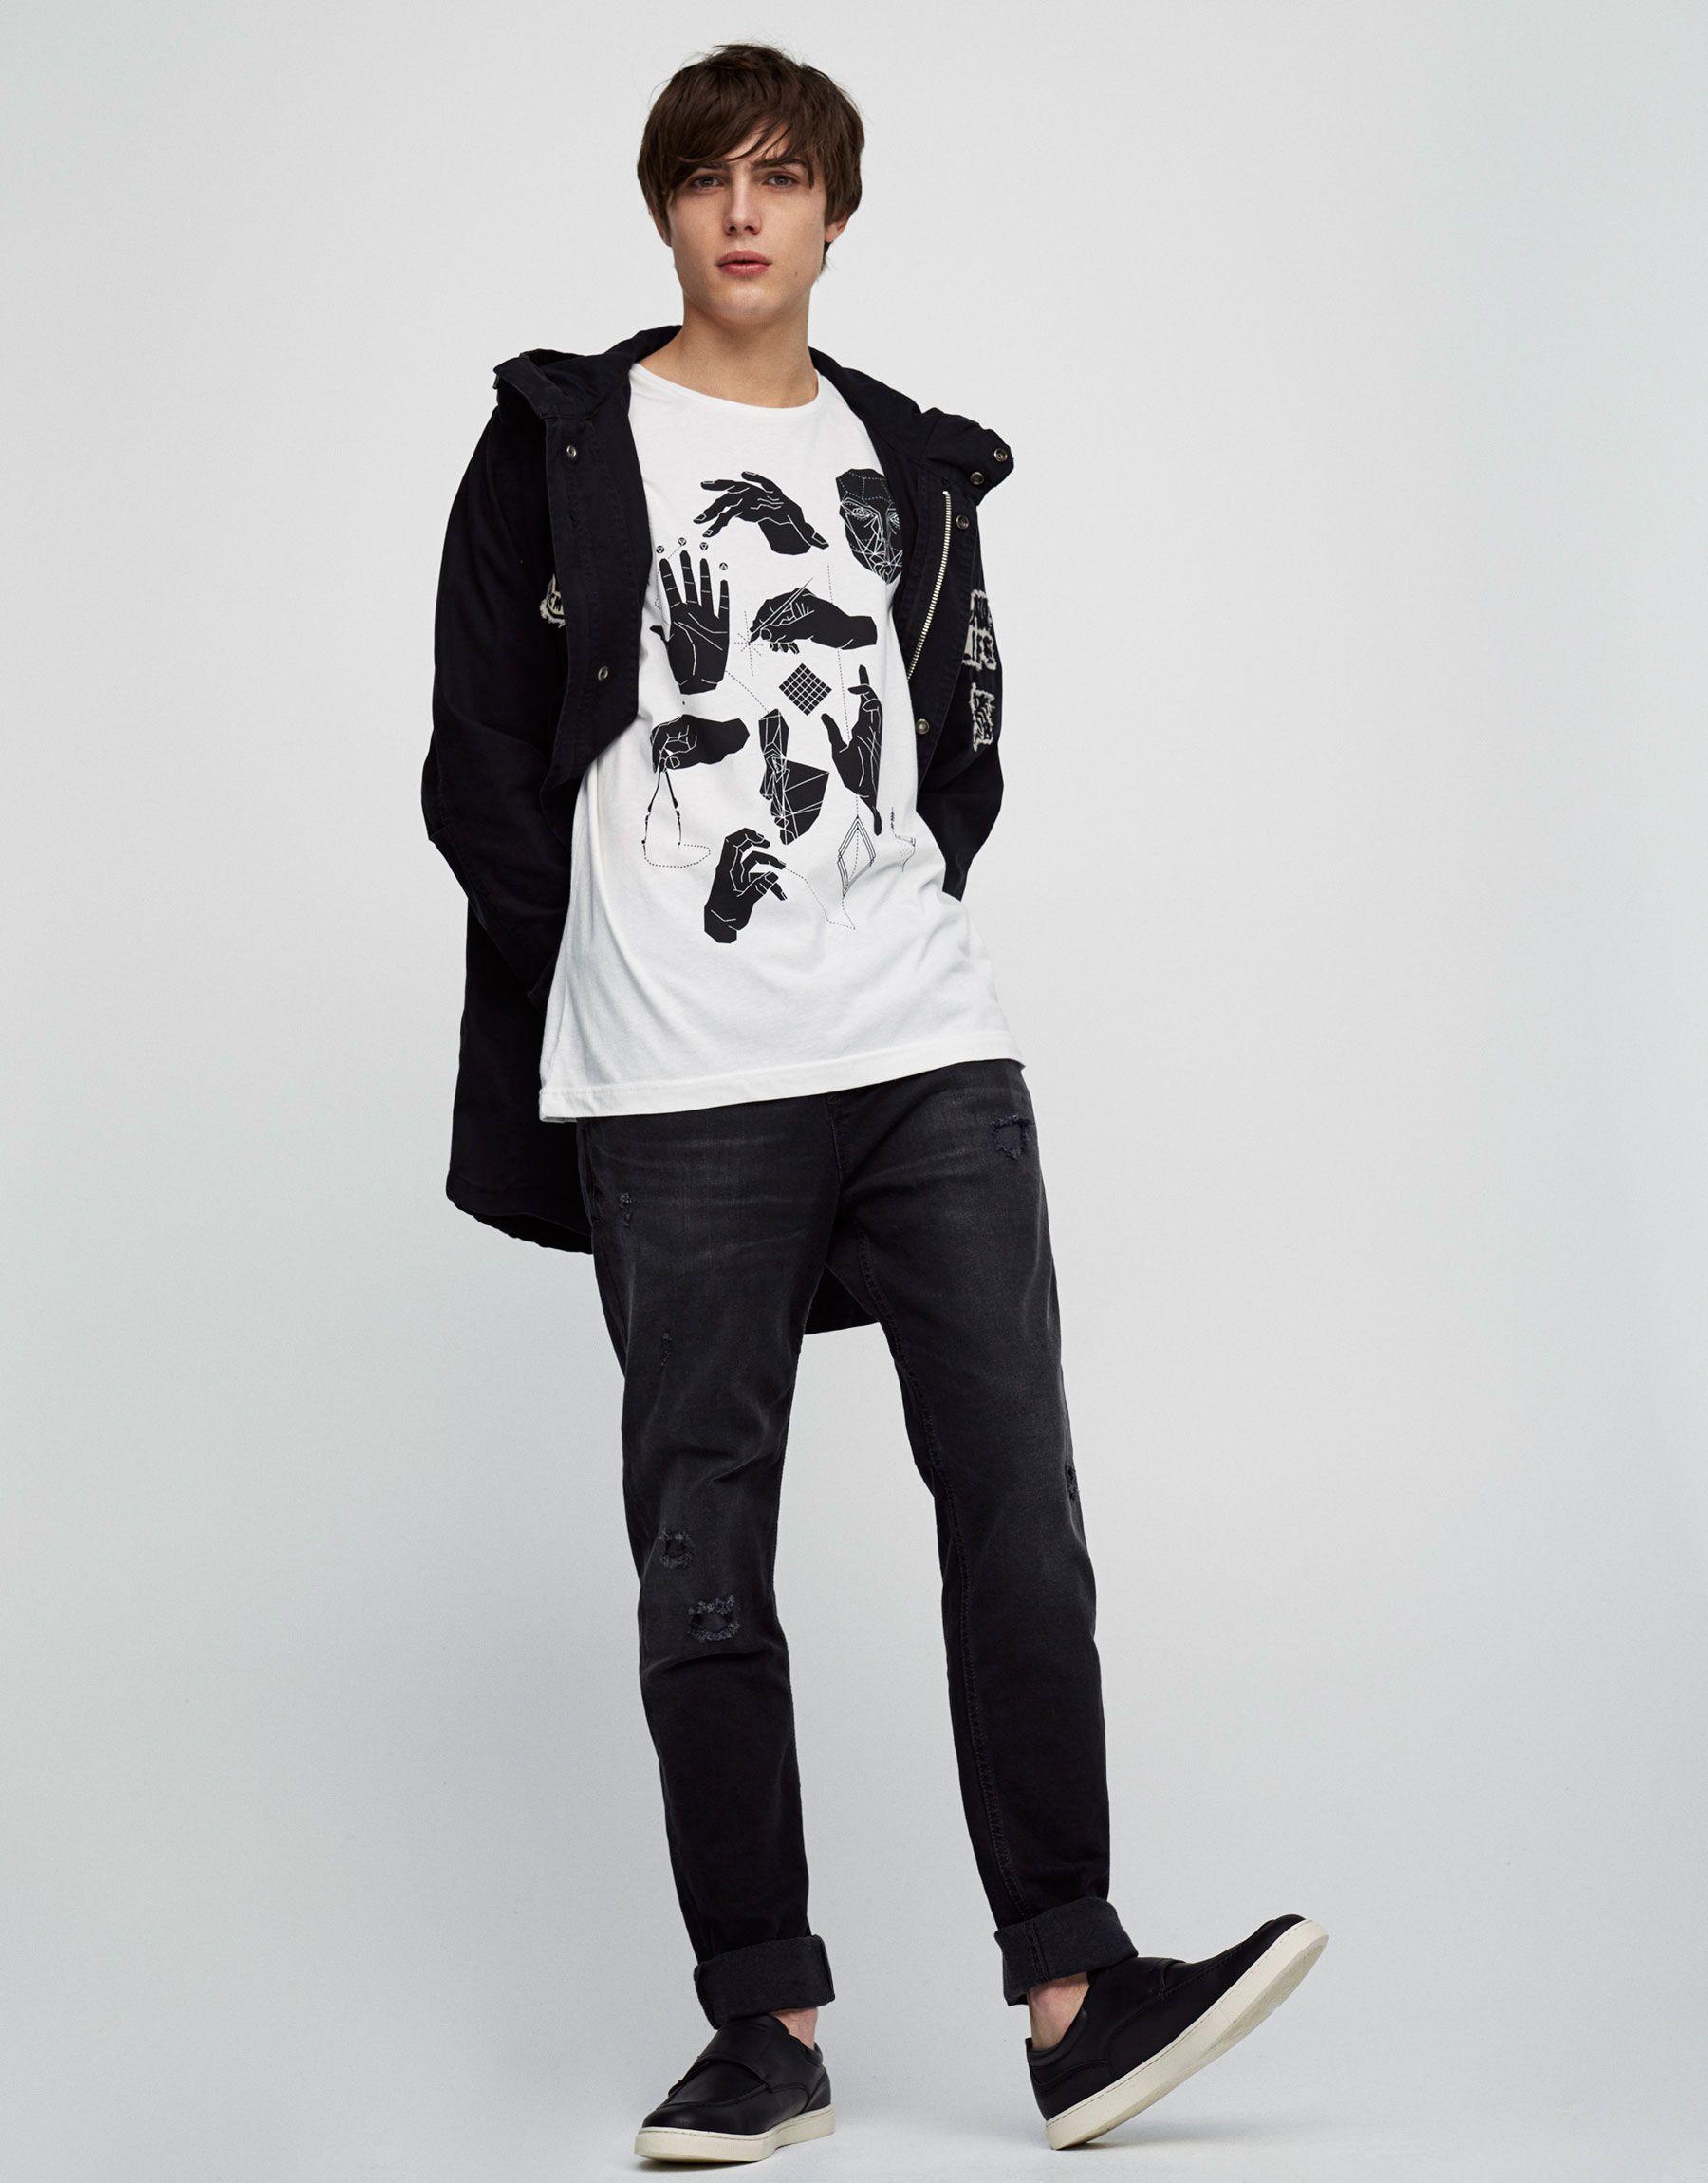 Dark wash slim fit jeans - Jeans - Clothing - Man - PULL&BEAR Israel